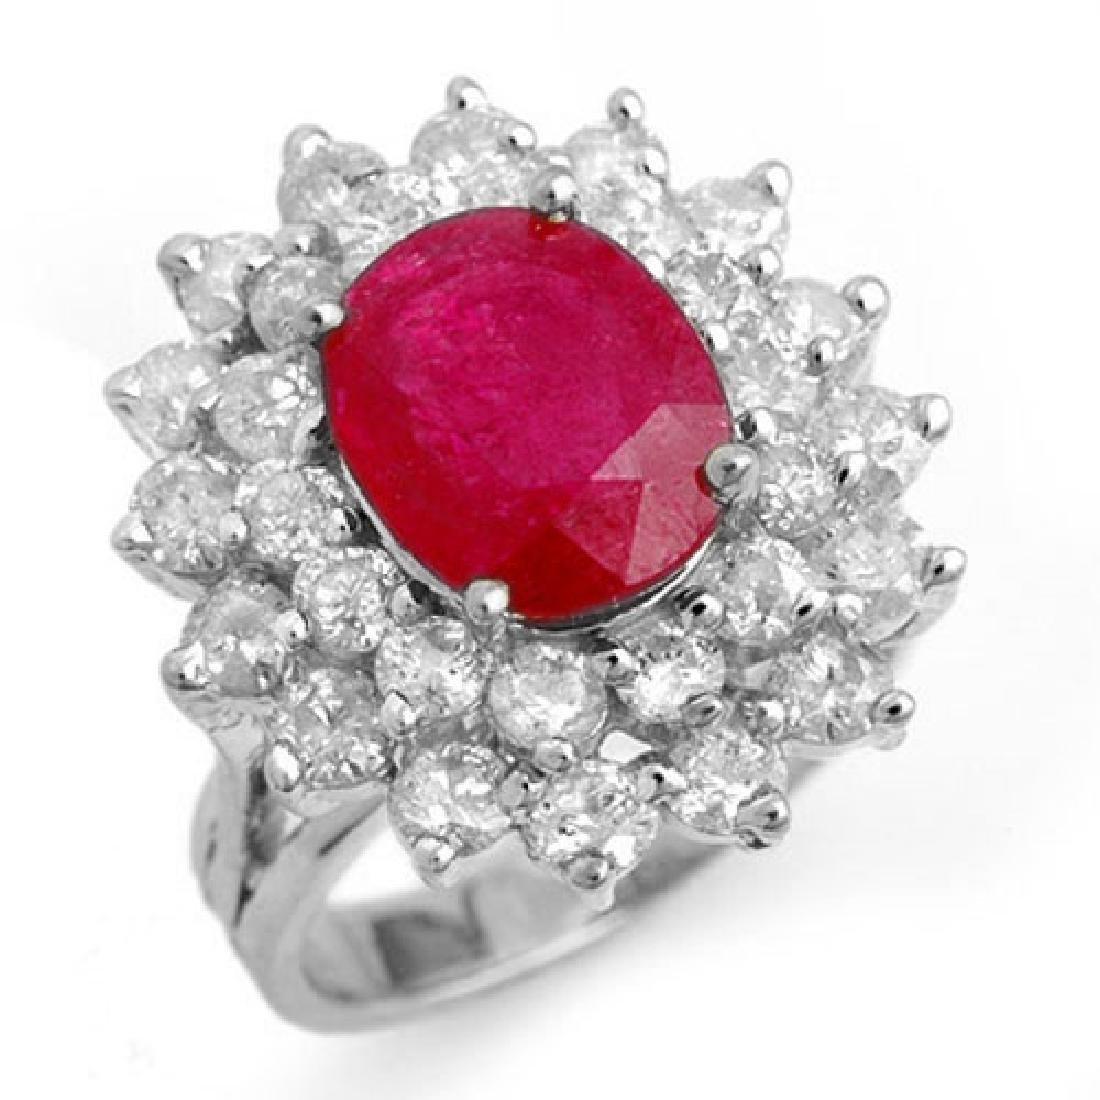 8.0 CTW Ruby & Diamond Ring 18K White Gold